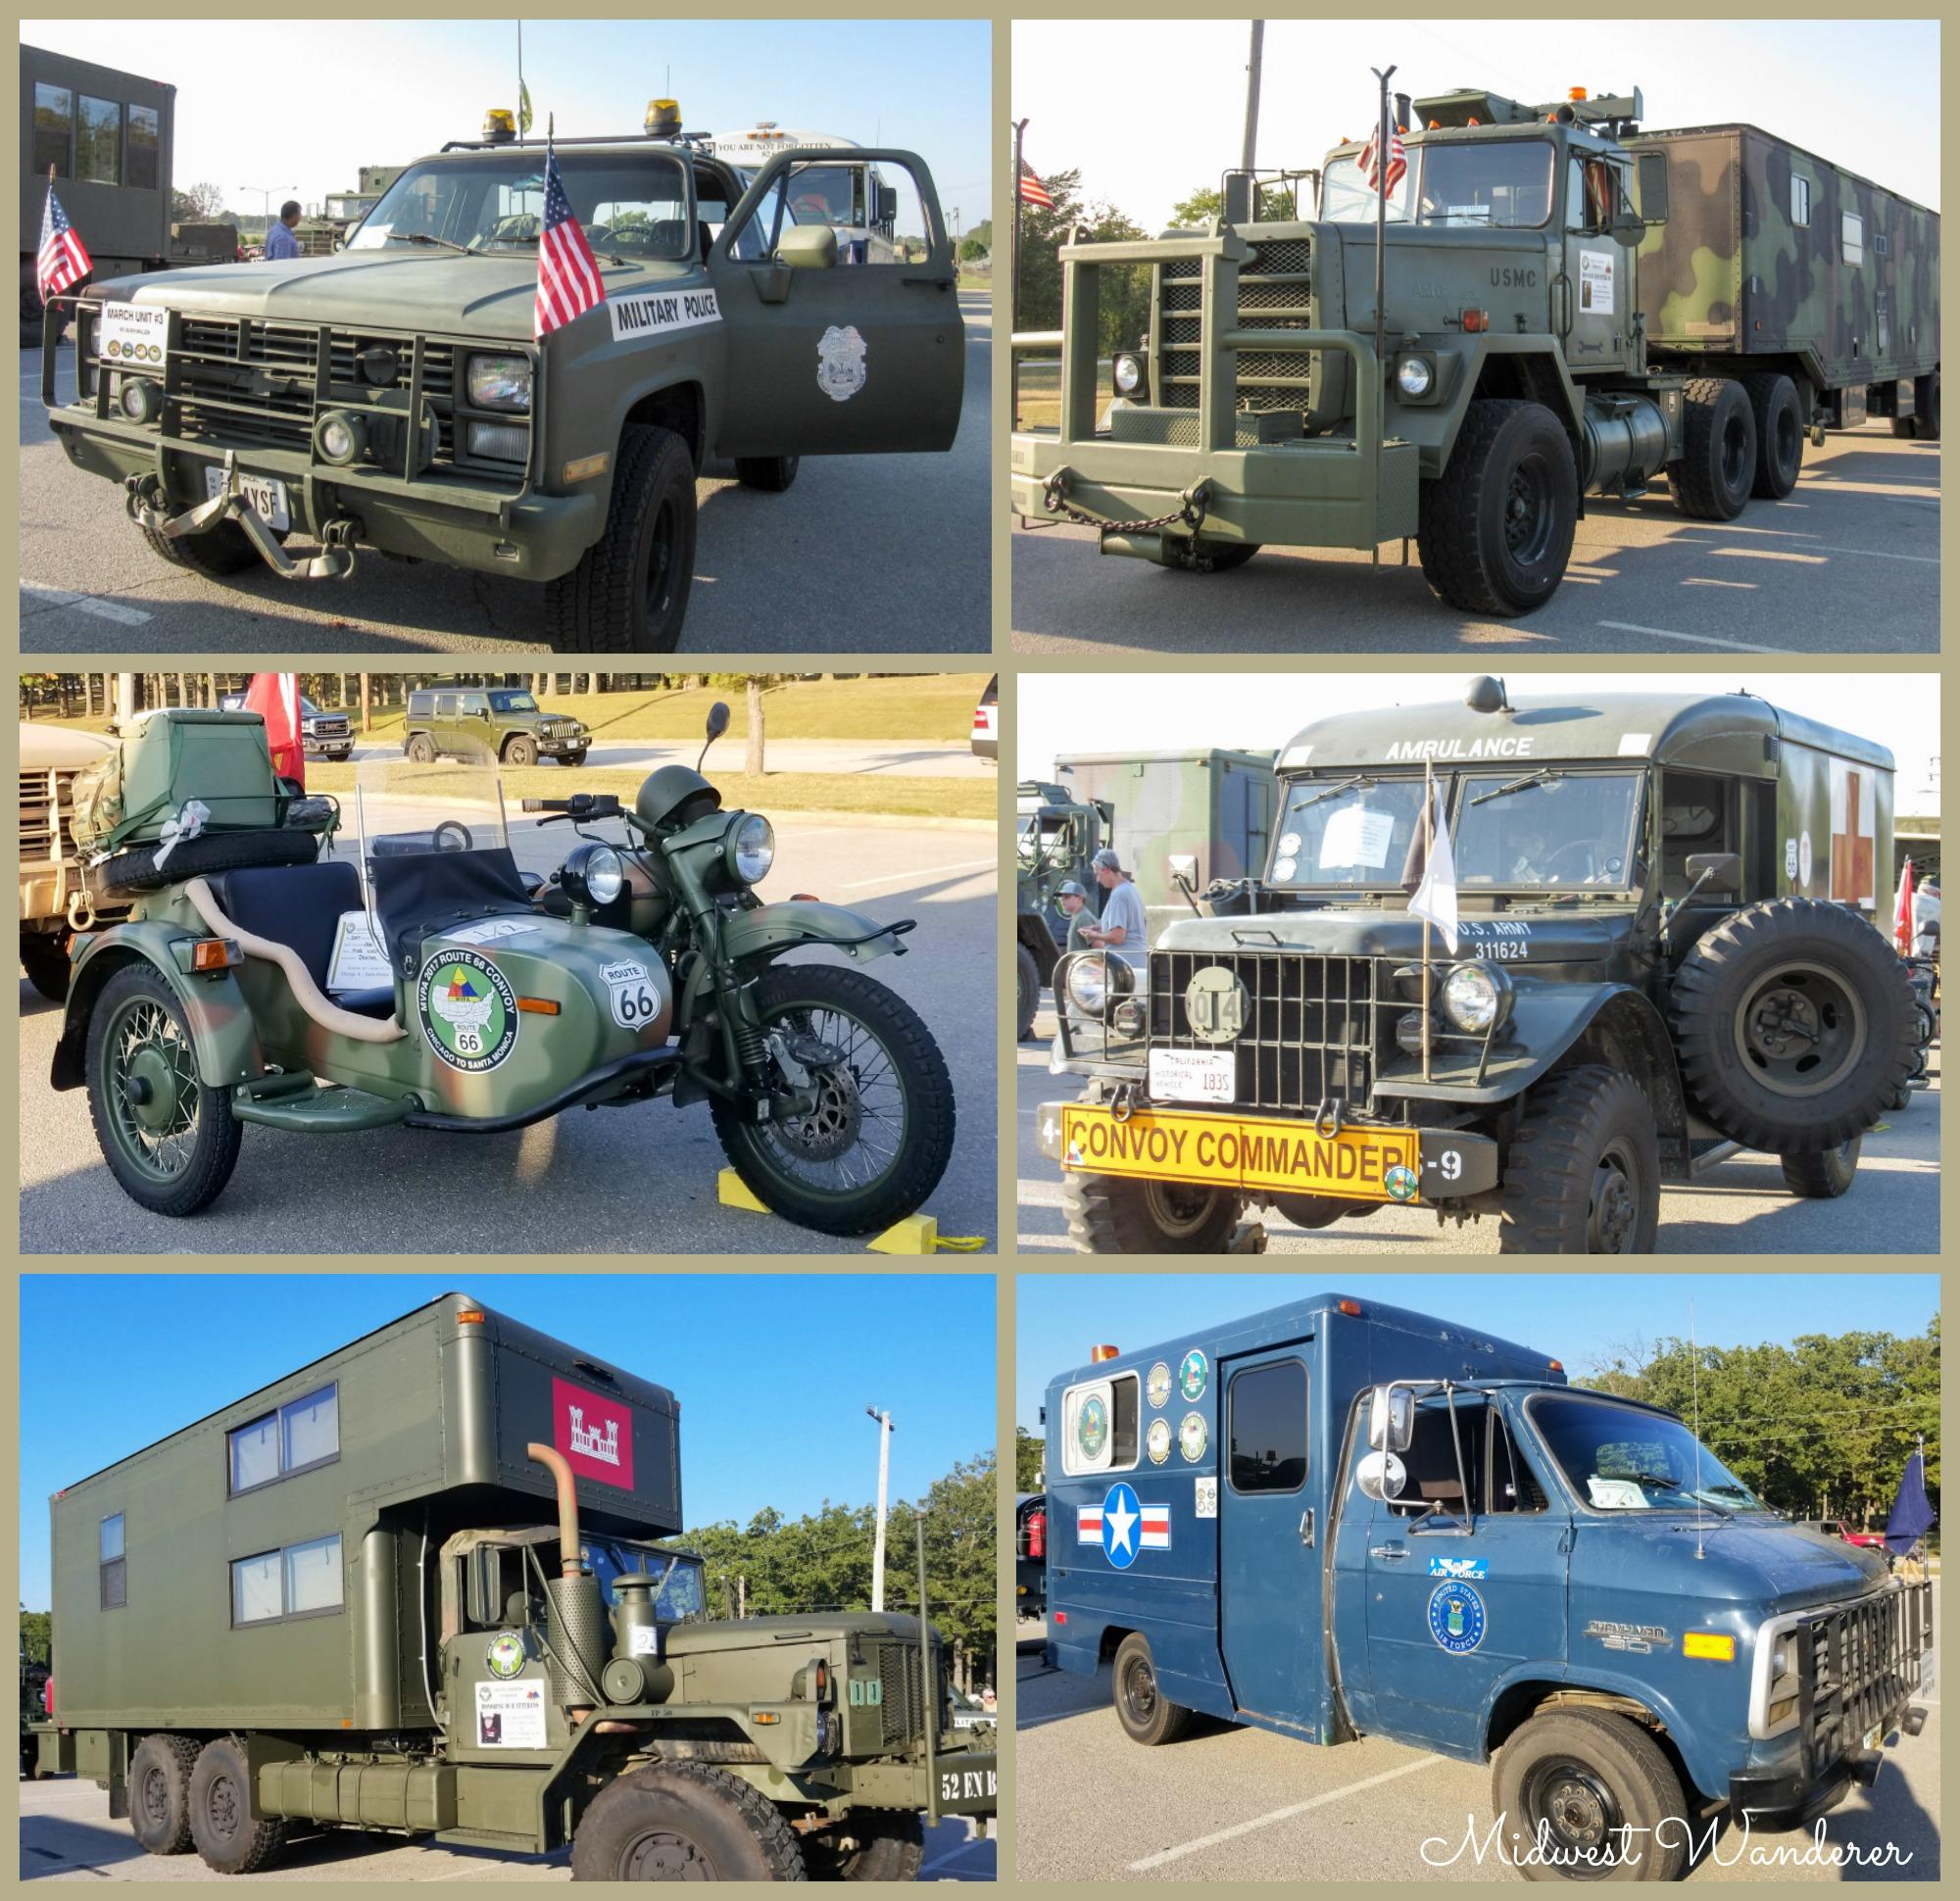 MVPA 2017 Route 66 Convoy - Collage 1